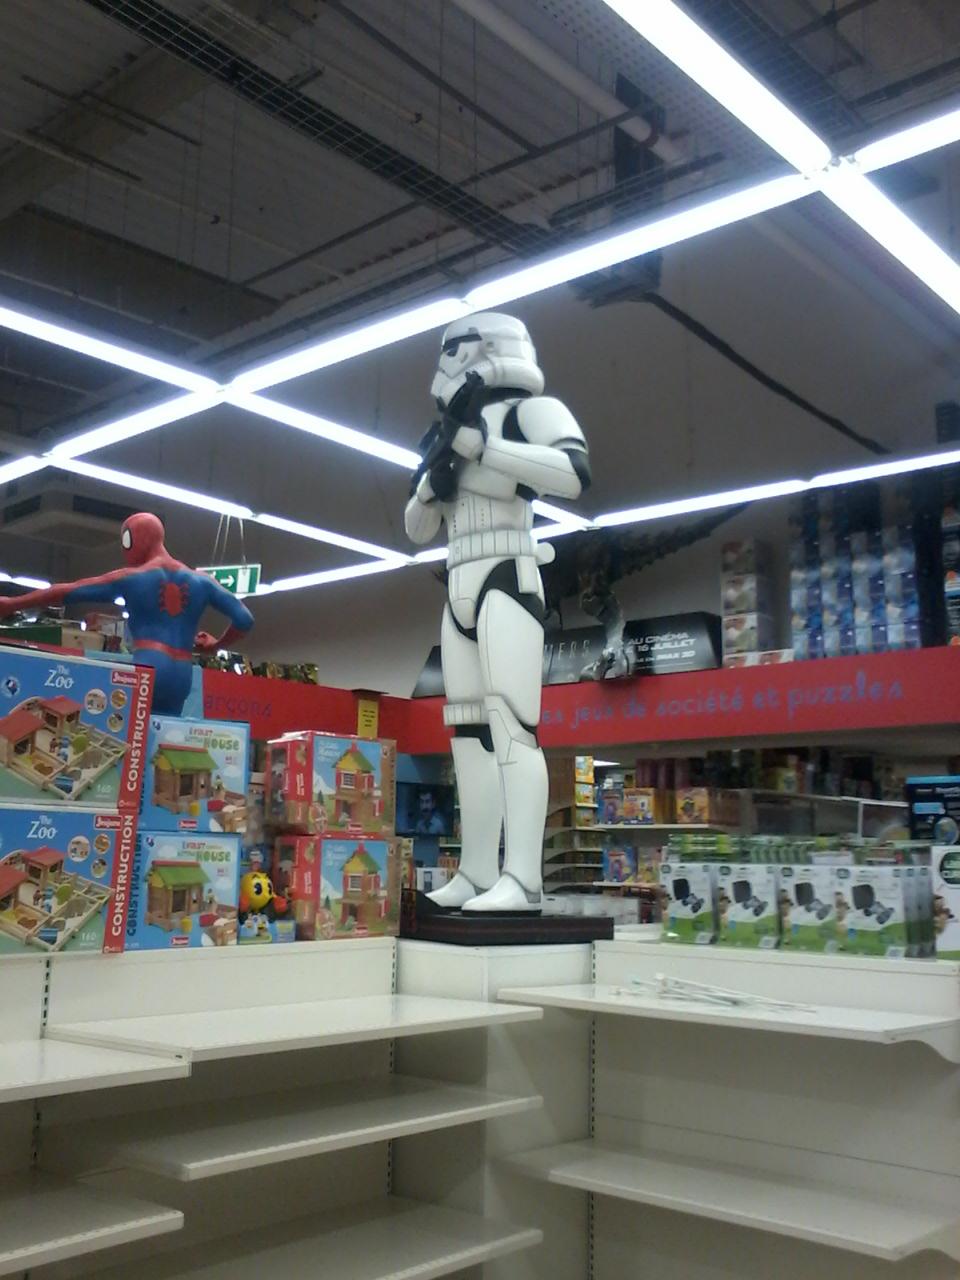 Topic Rebels (jouets et séries) - Page 2 231457Photo0061